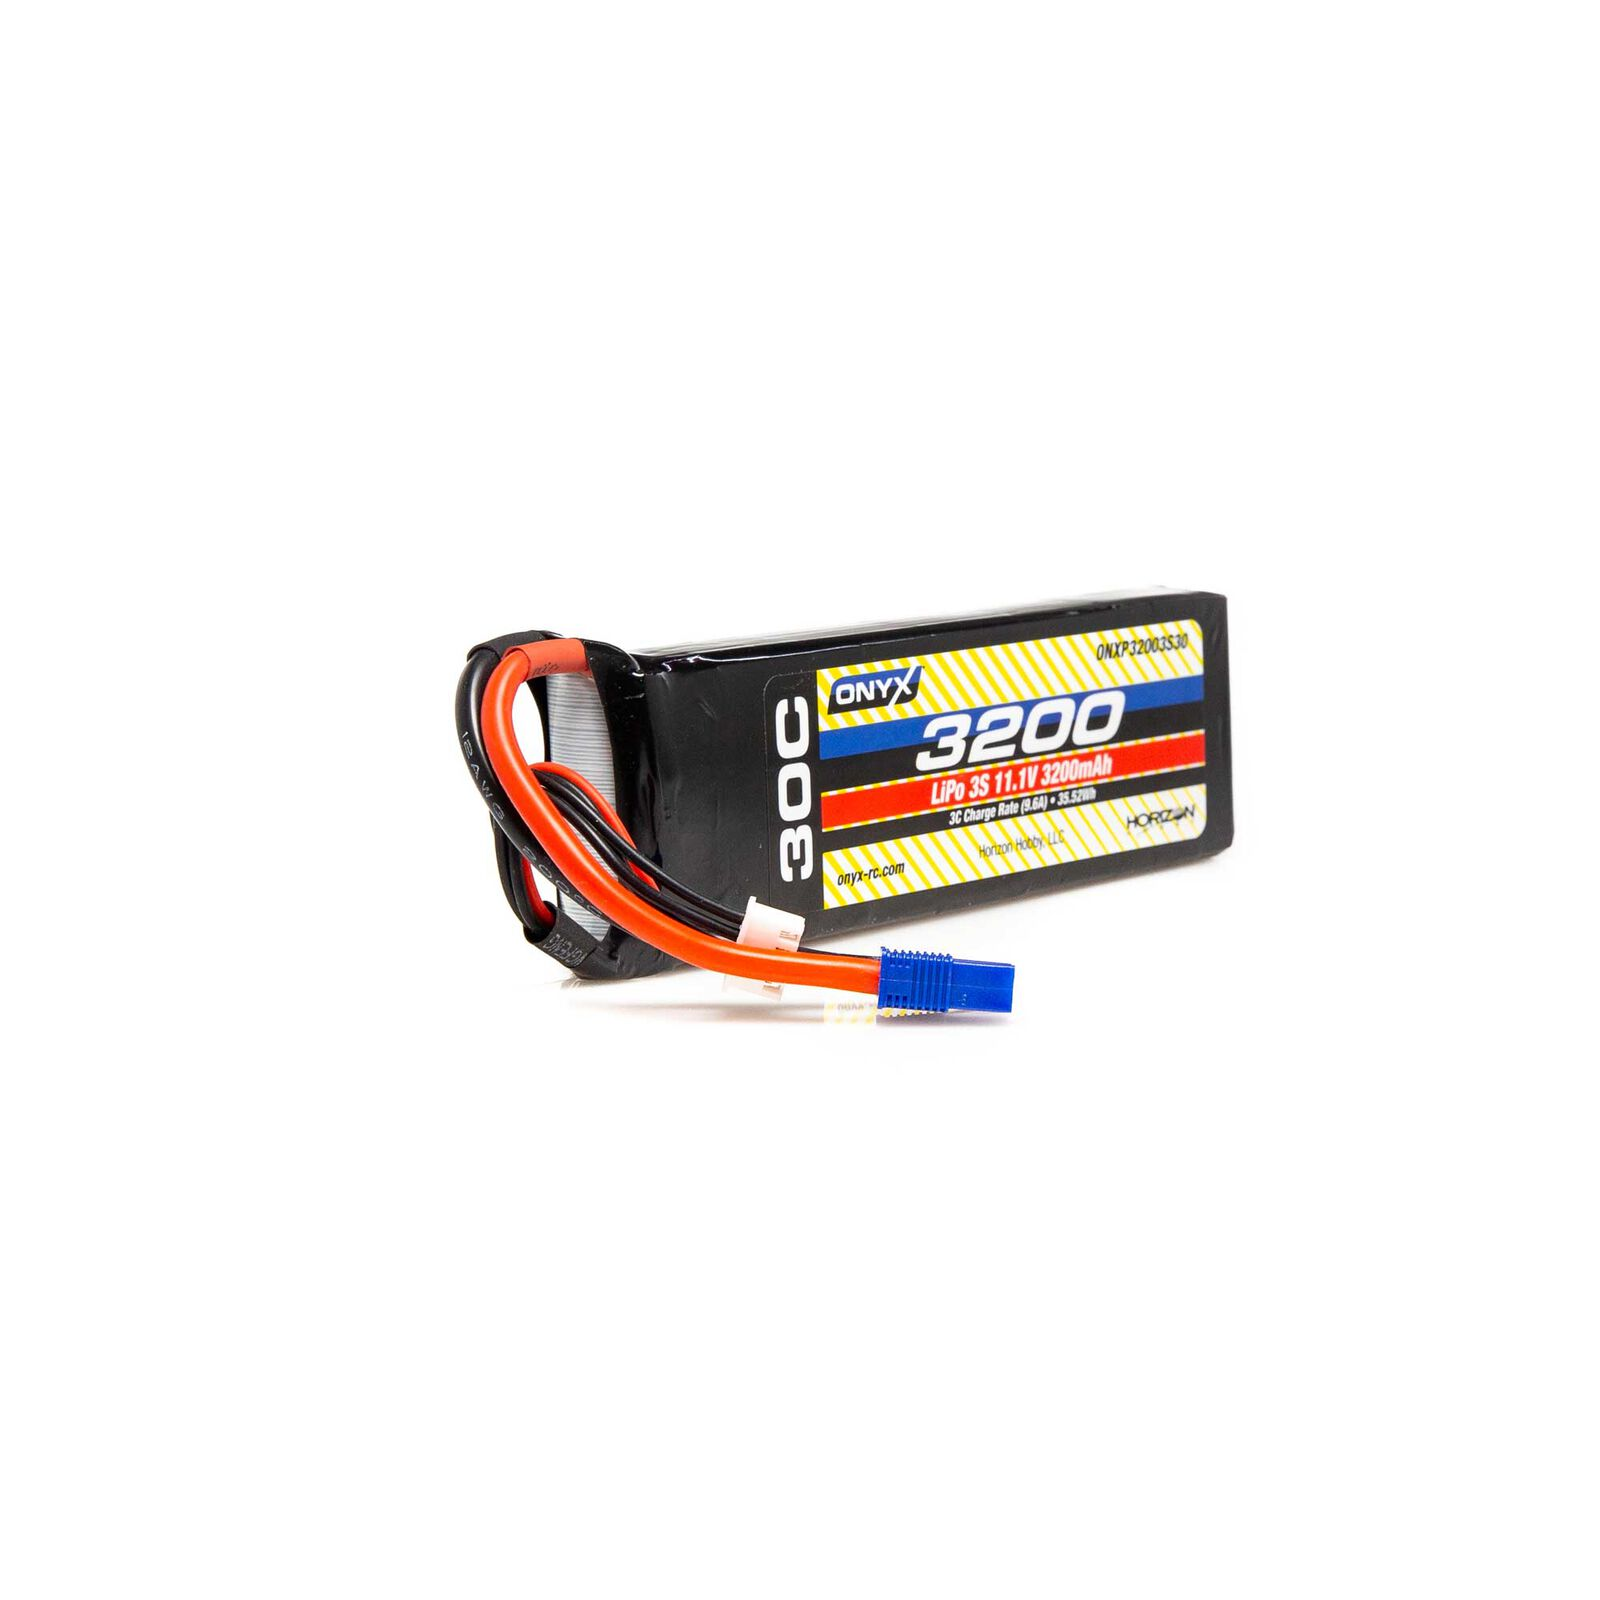 11.1V 3200mAh 3S 30C LiPo Battery: EC3